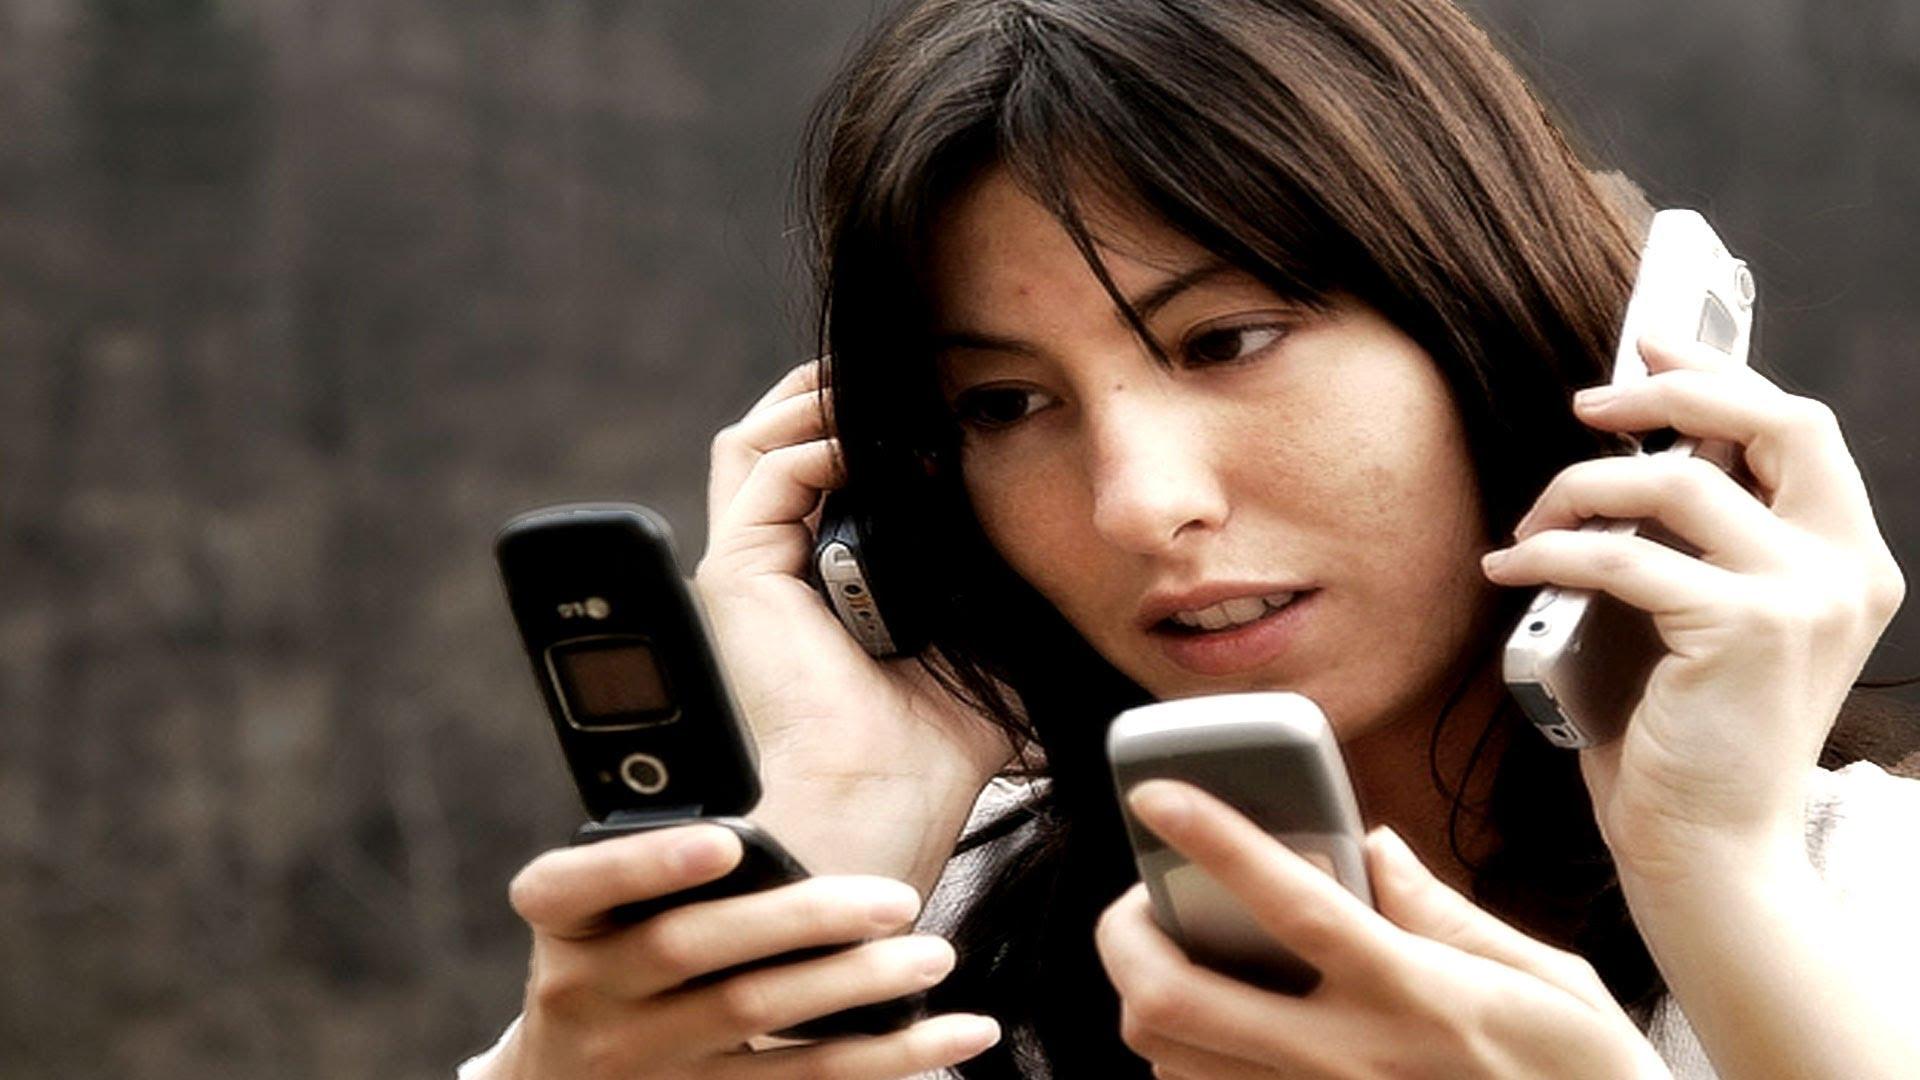 картинки для телефона звонит мужу на мобильник время будапешт